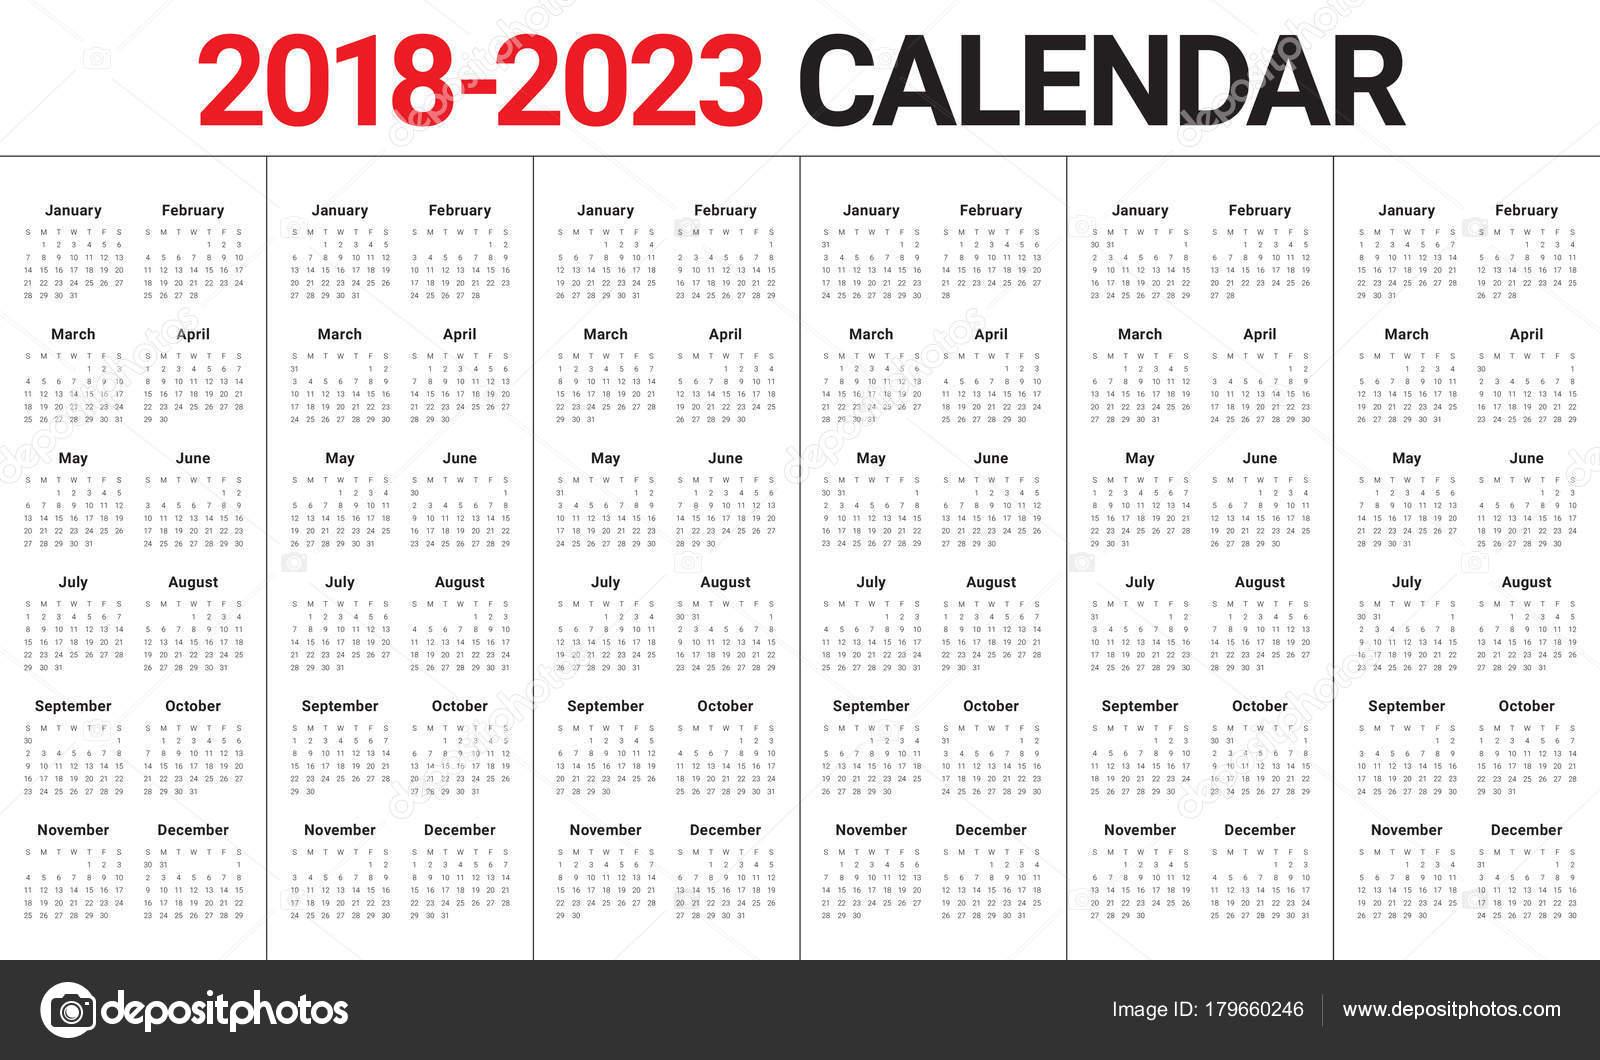 3 Year Calendar 2021 To 2023 | Calendar Printables Free ...